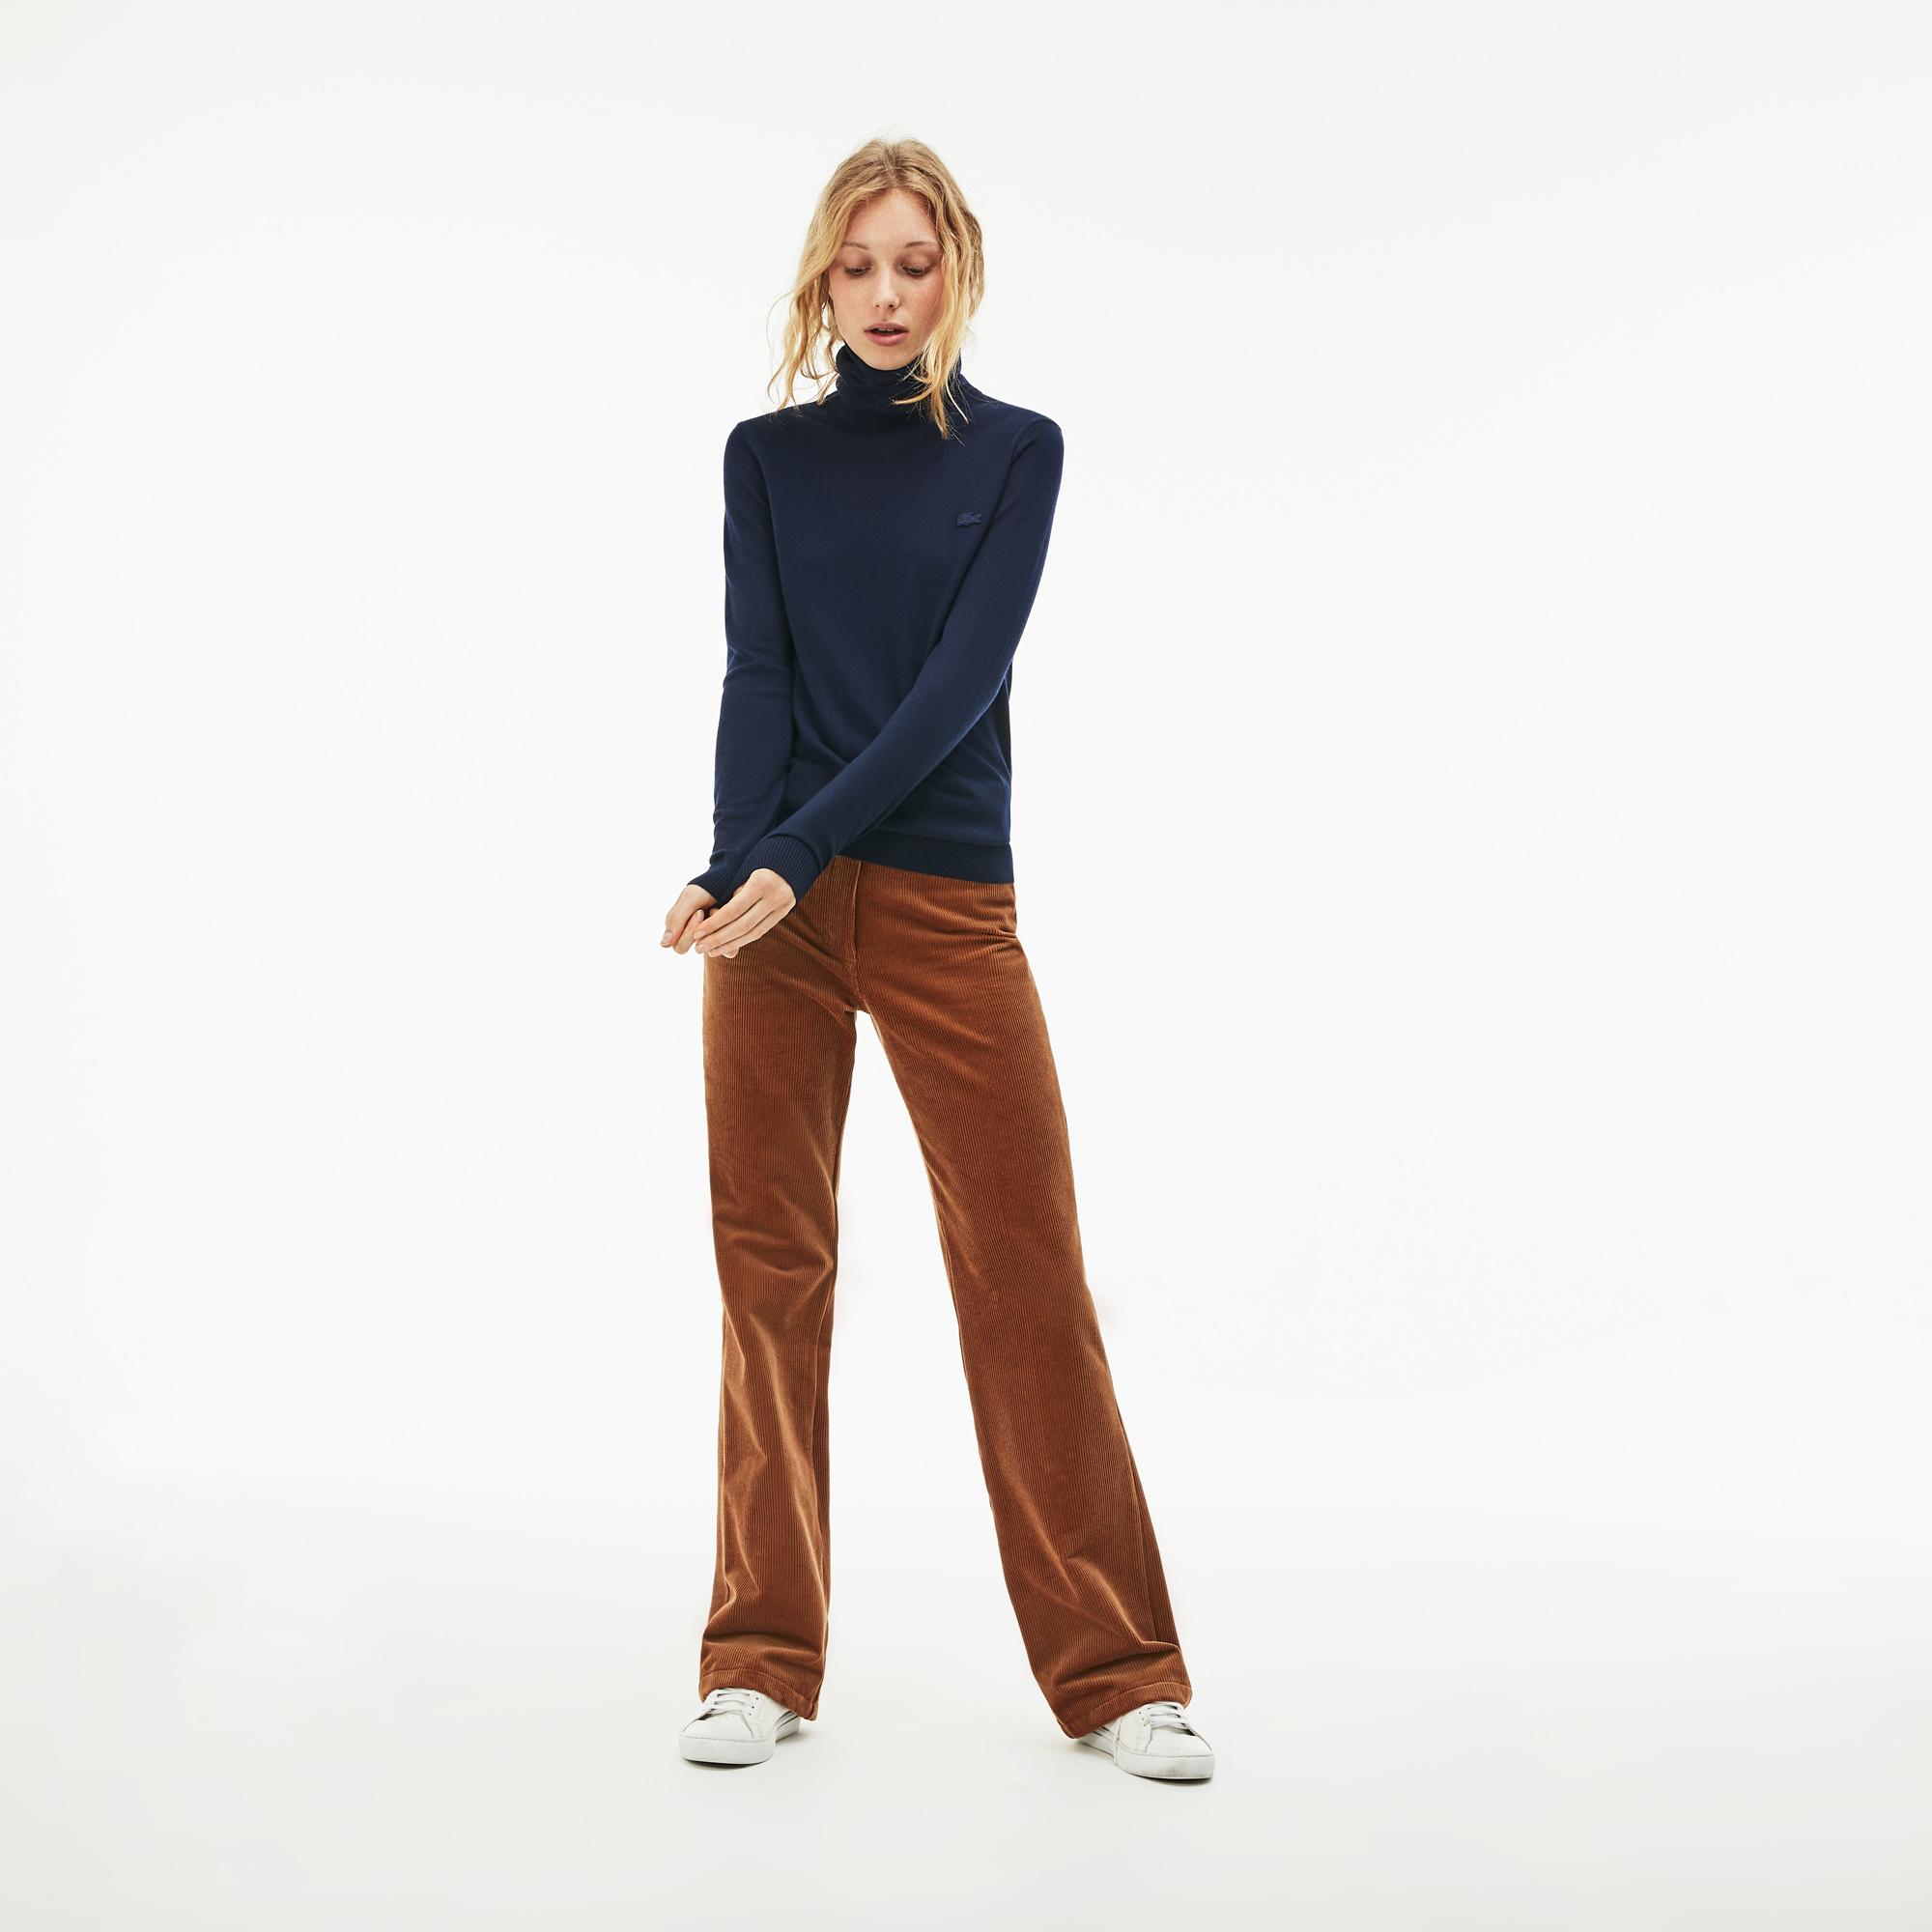 Фото 3 - Женский свитер Lacoste темно-синего цвета